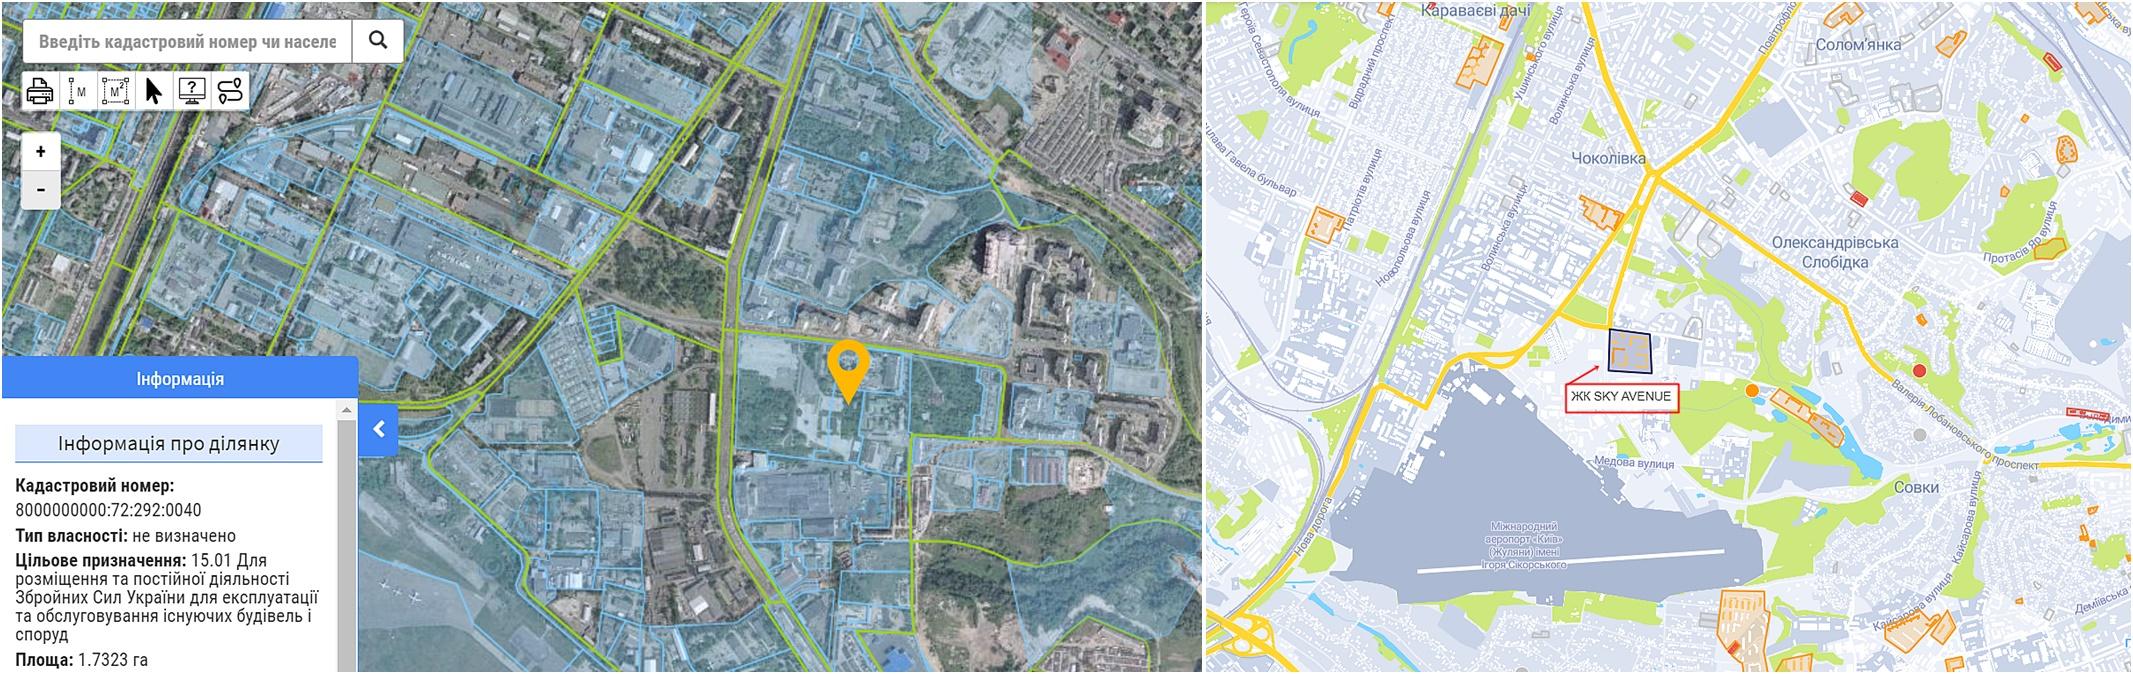 ЖК SKY AVENUE данные кадастра и на карте